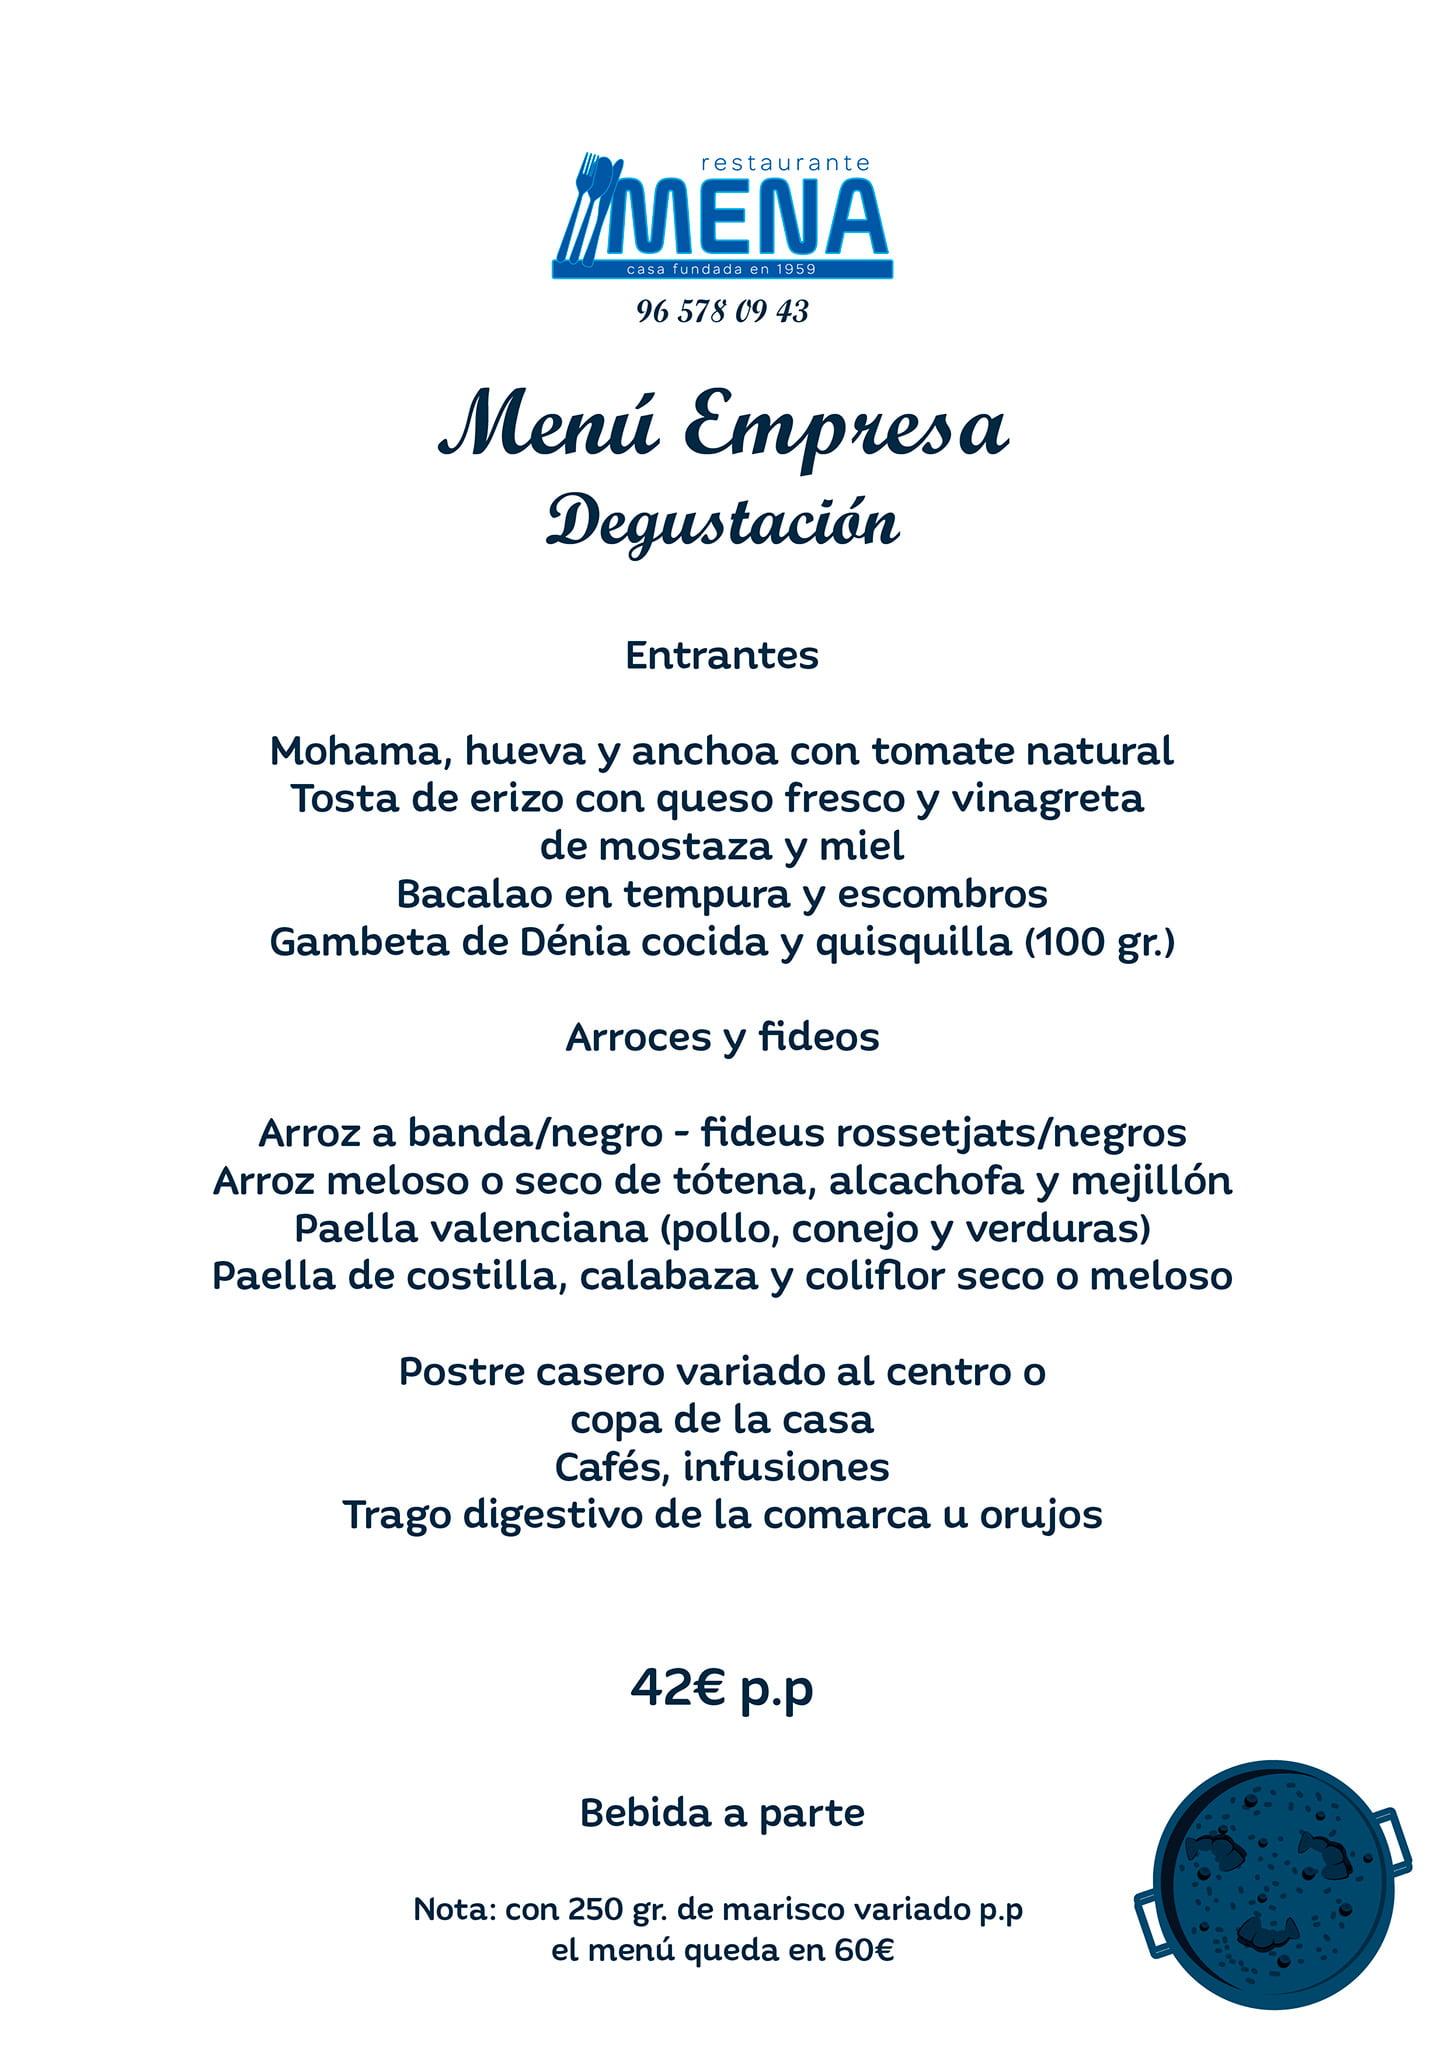 menu-de-empresa-unesco-restaurante-mena